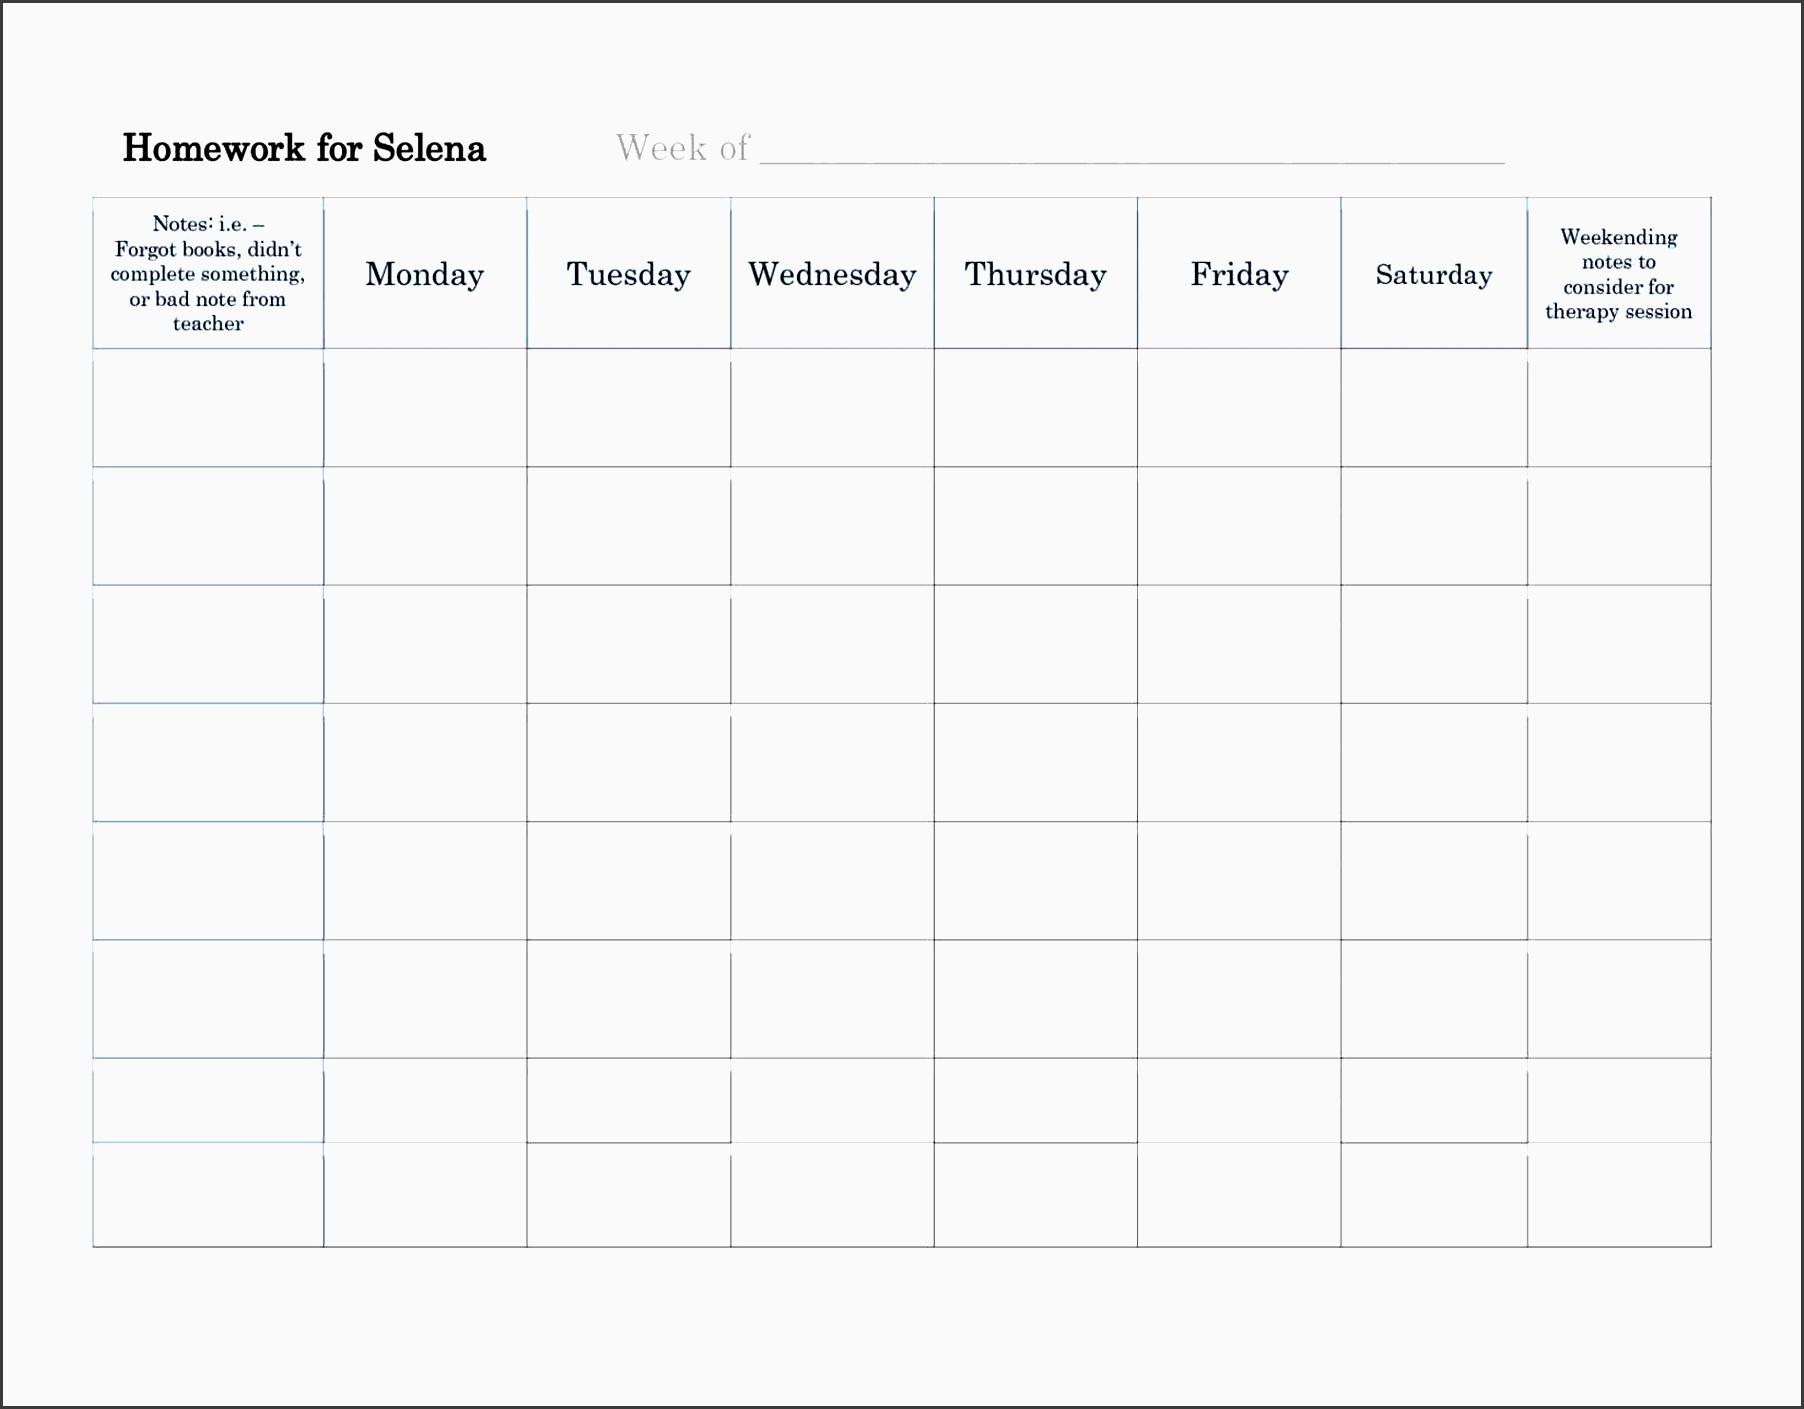 Free Printable Homework Planner - Your Modern Family